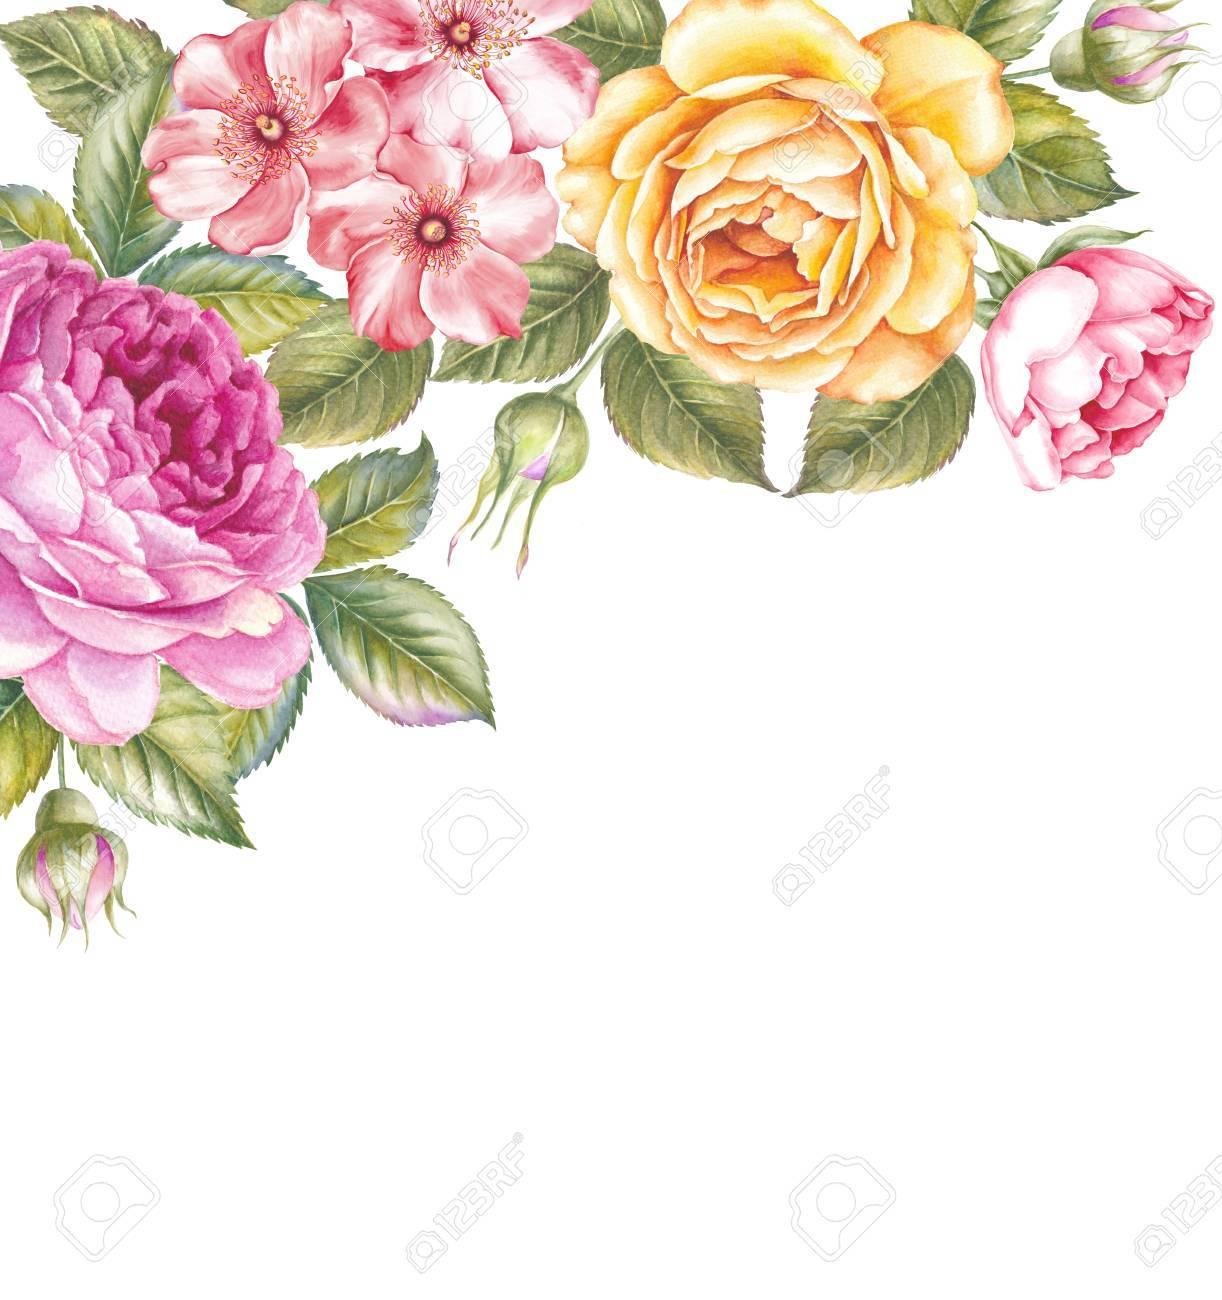 Blooming Rose Flower Watercolor Illustration Cute Pink Roses In